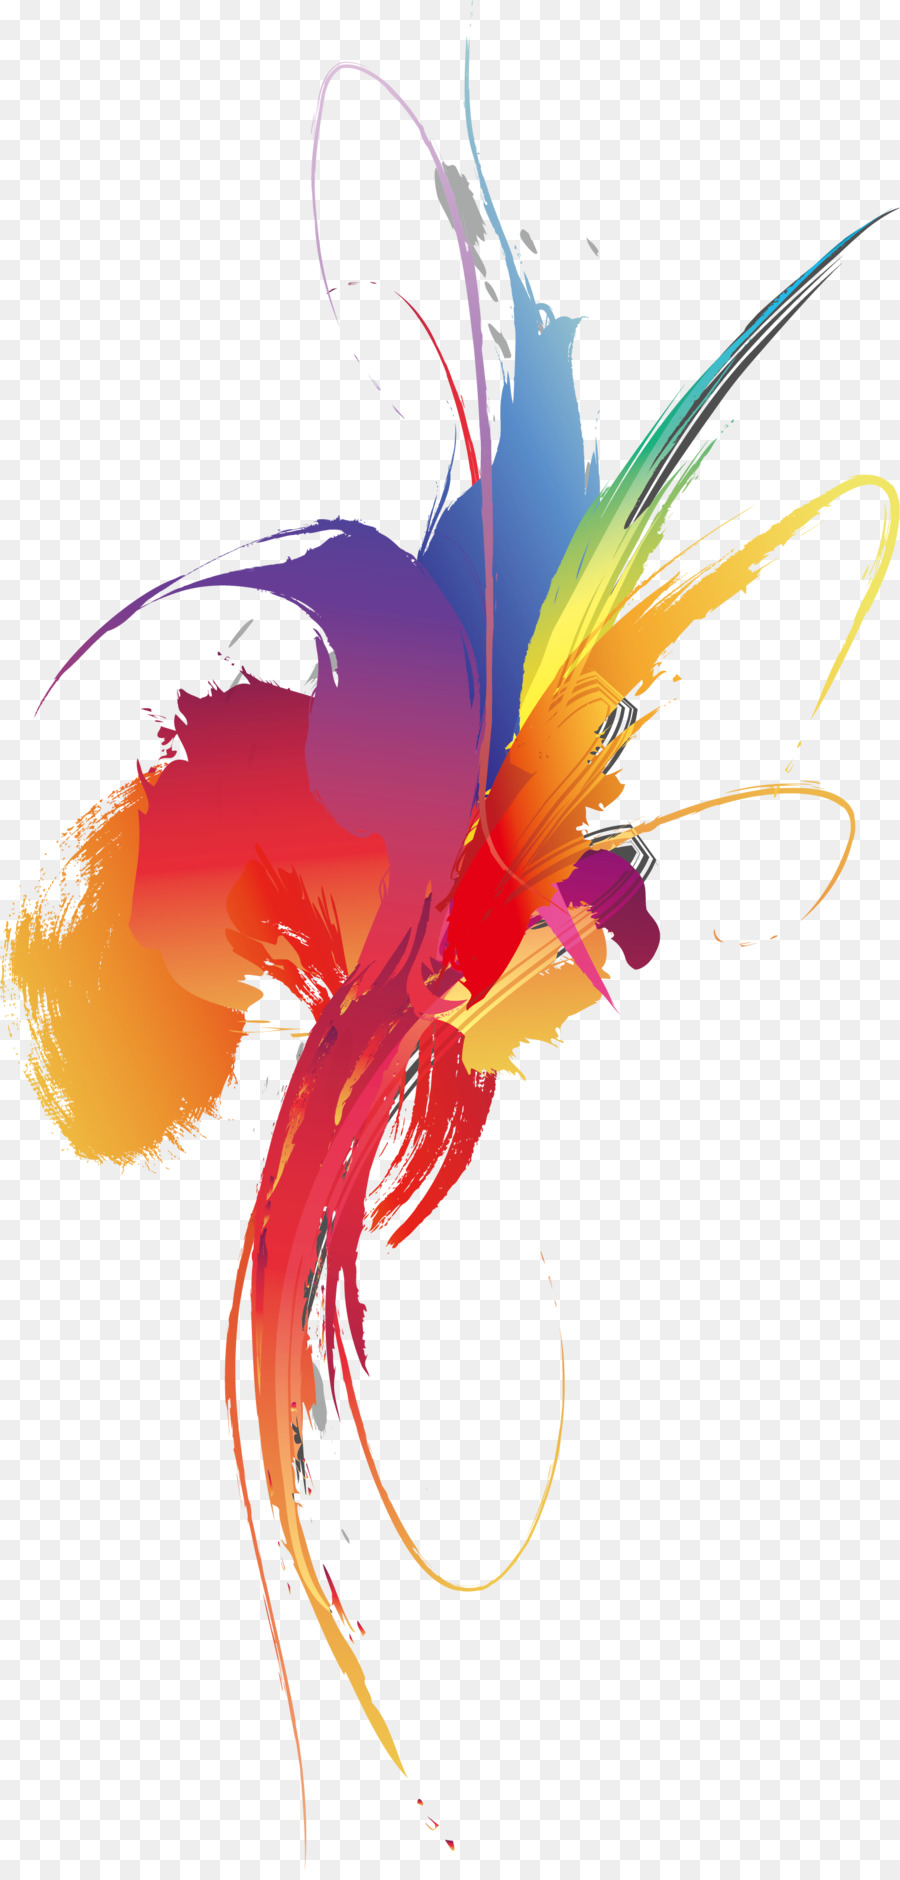 Graphic design Color Wallpaper - Colorful smear splash color block ...